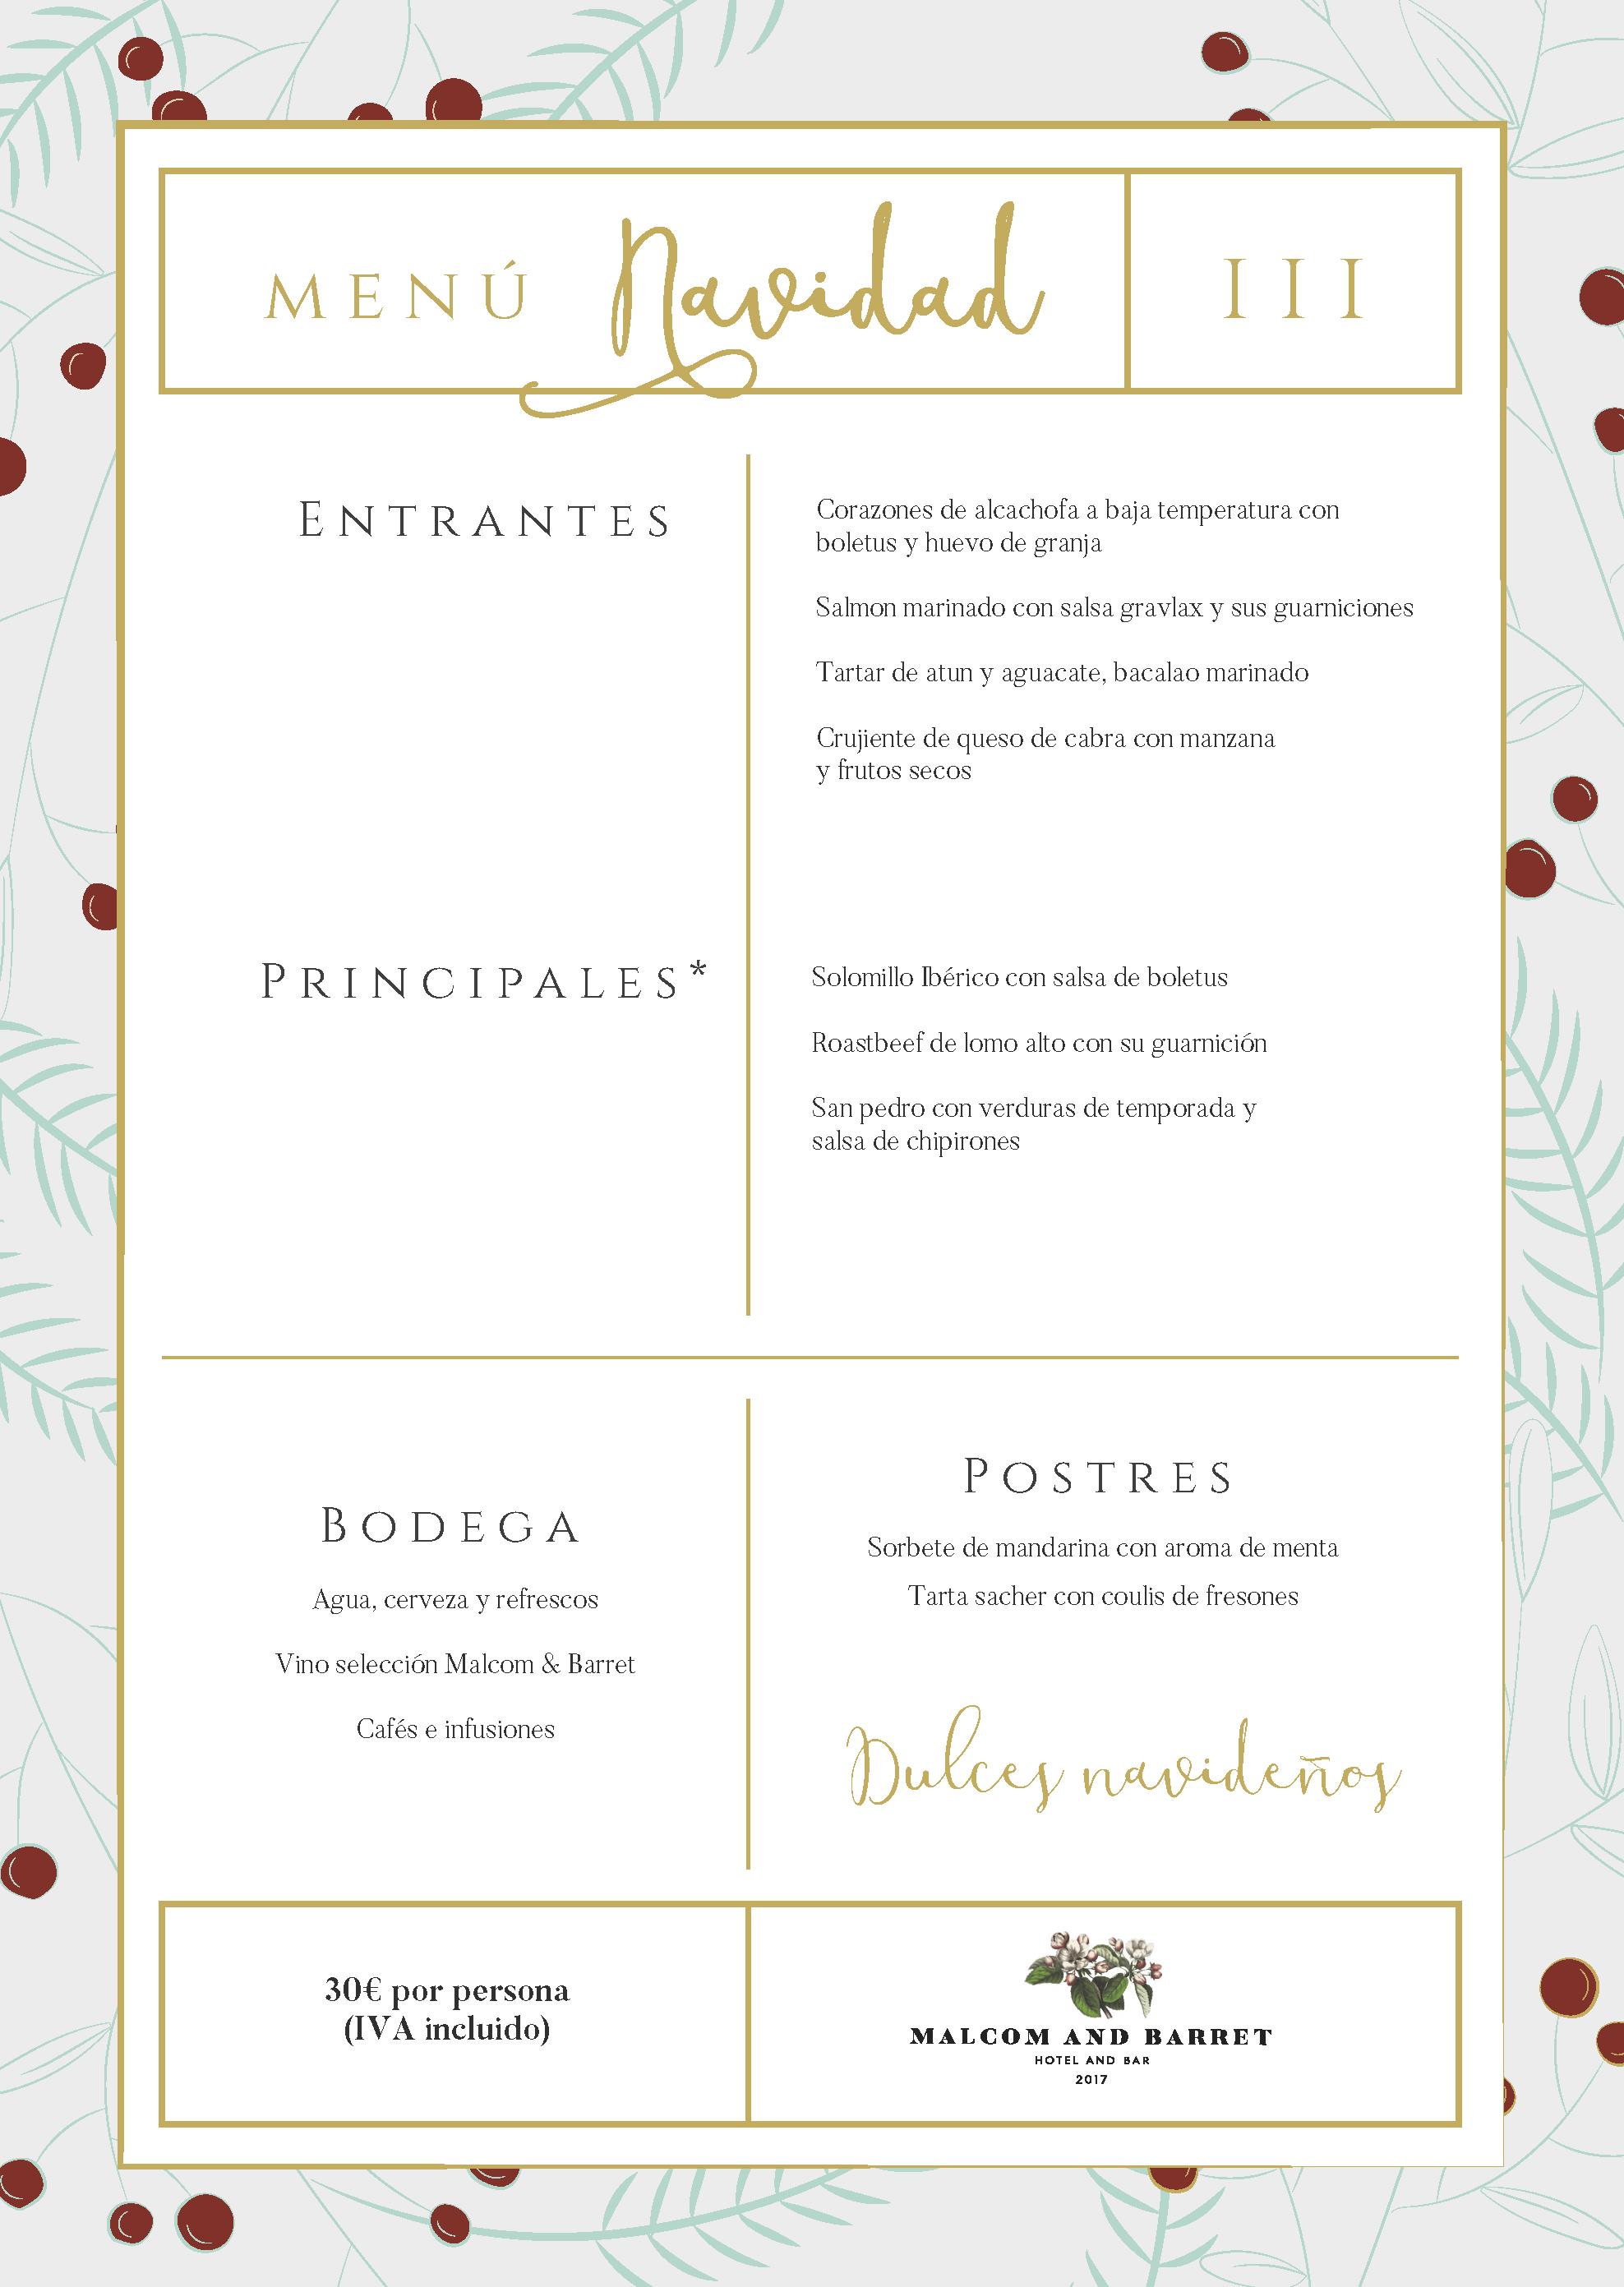 Menú Grupo Navidad Malcom and Barret ES (1)_Página_4